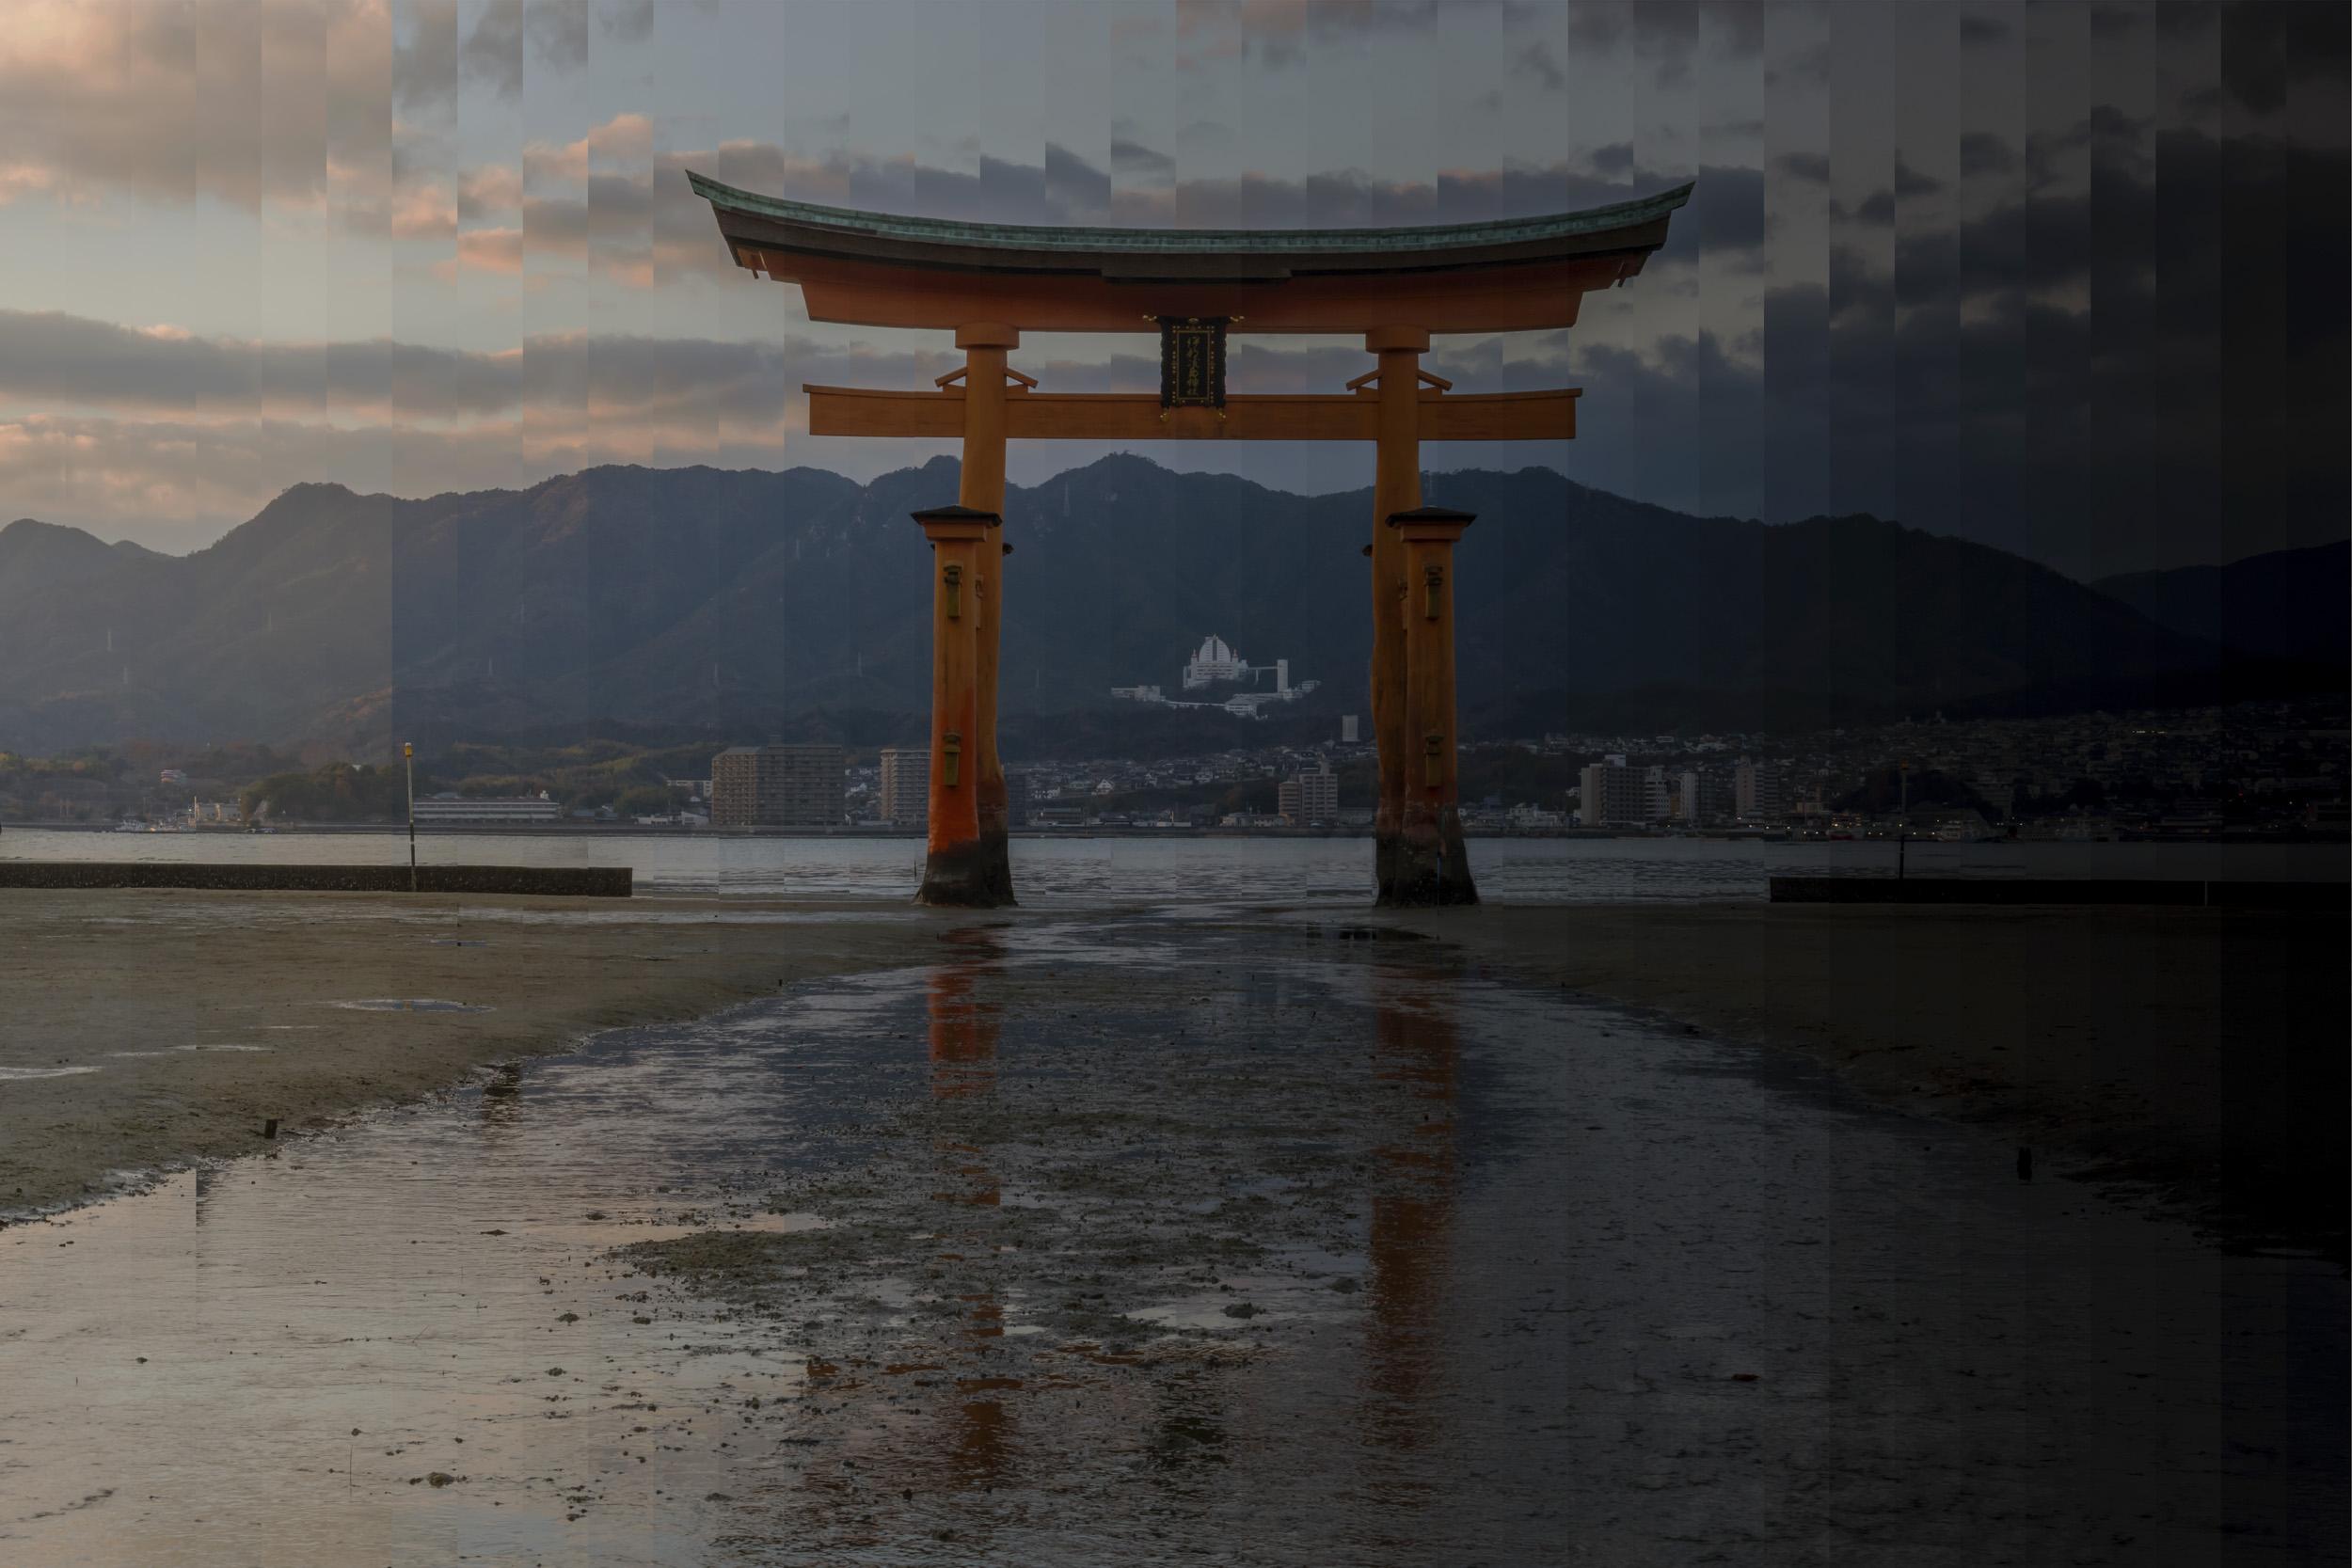 Itsukusjima Shrin, Hiroshima, Japan